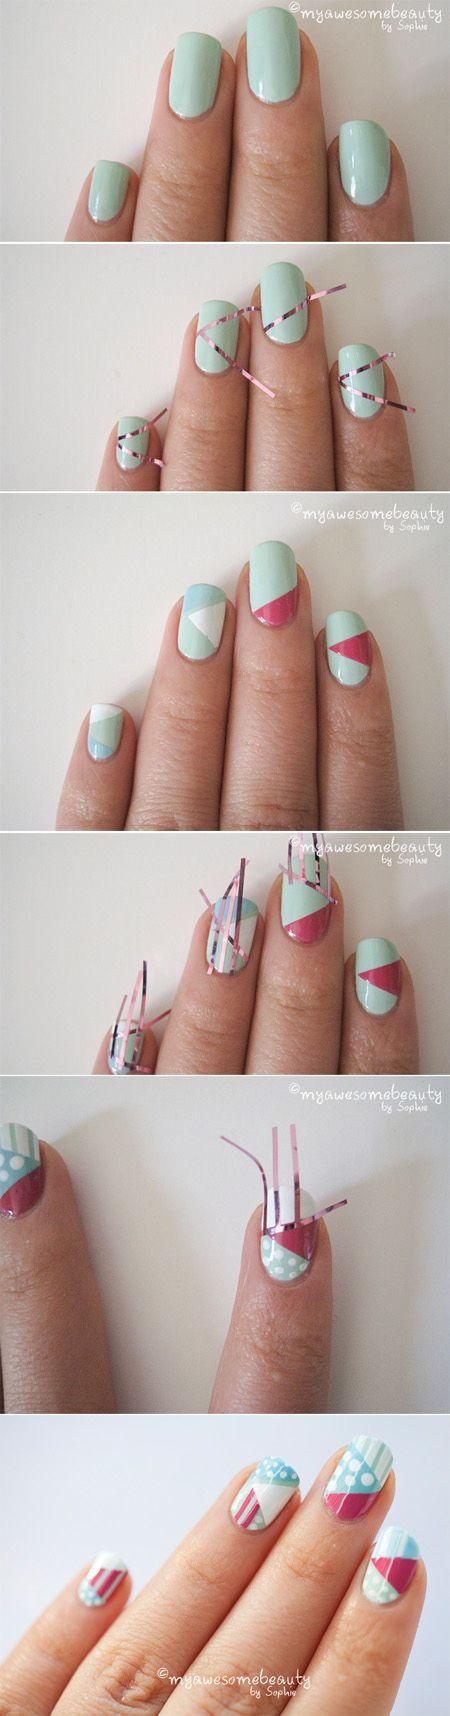 12 great DIY nail ideas! Geometric Nails